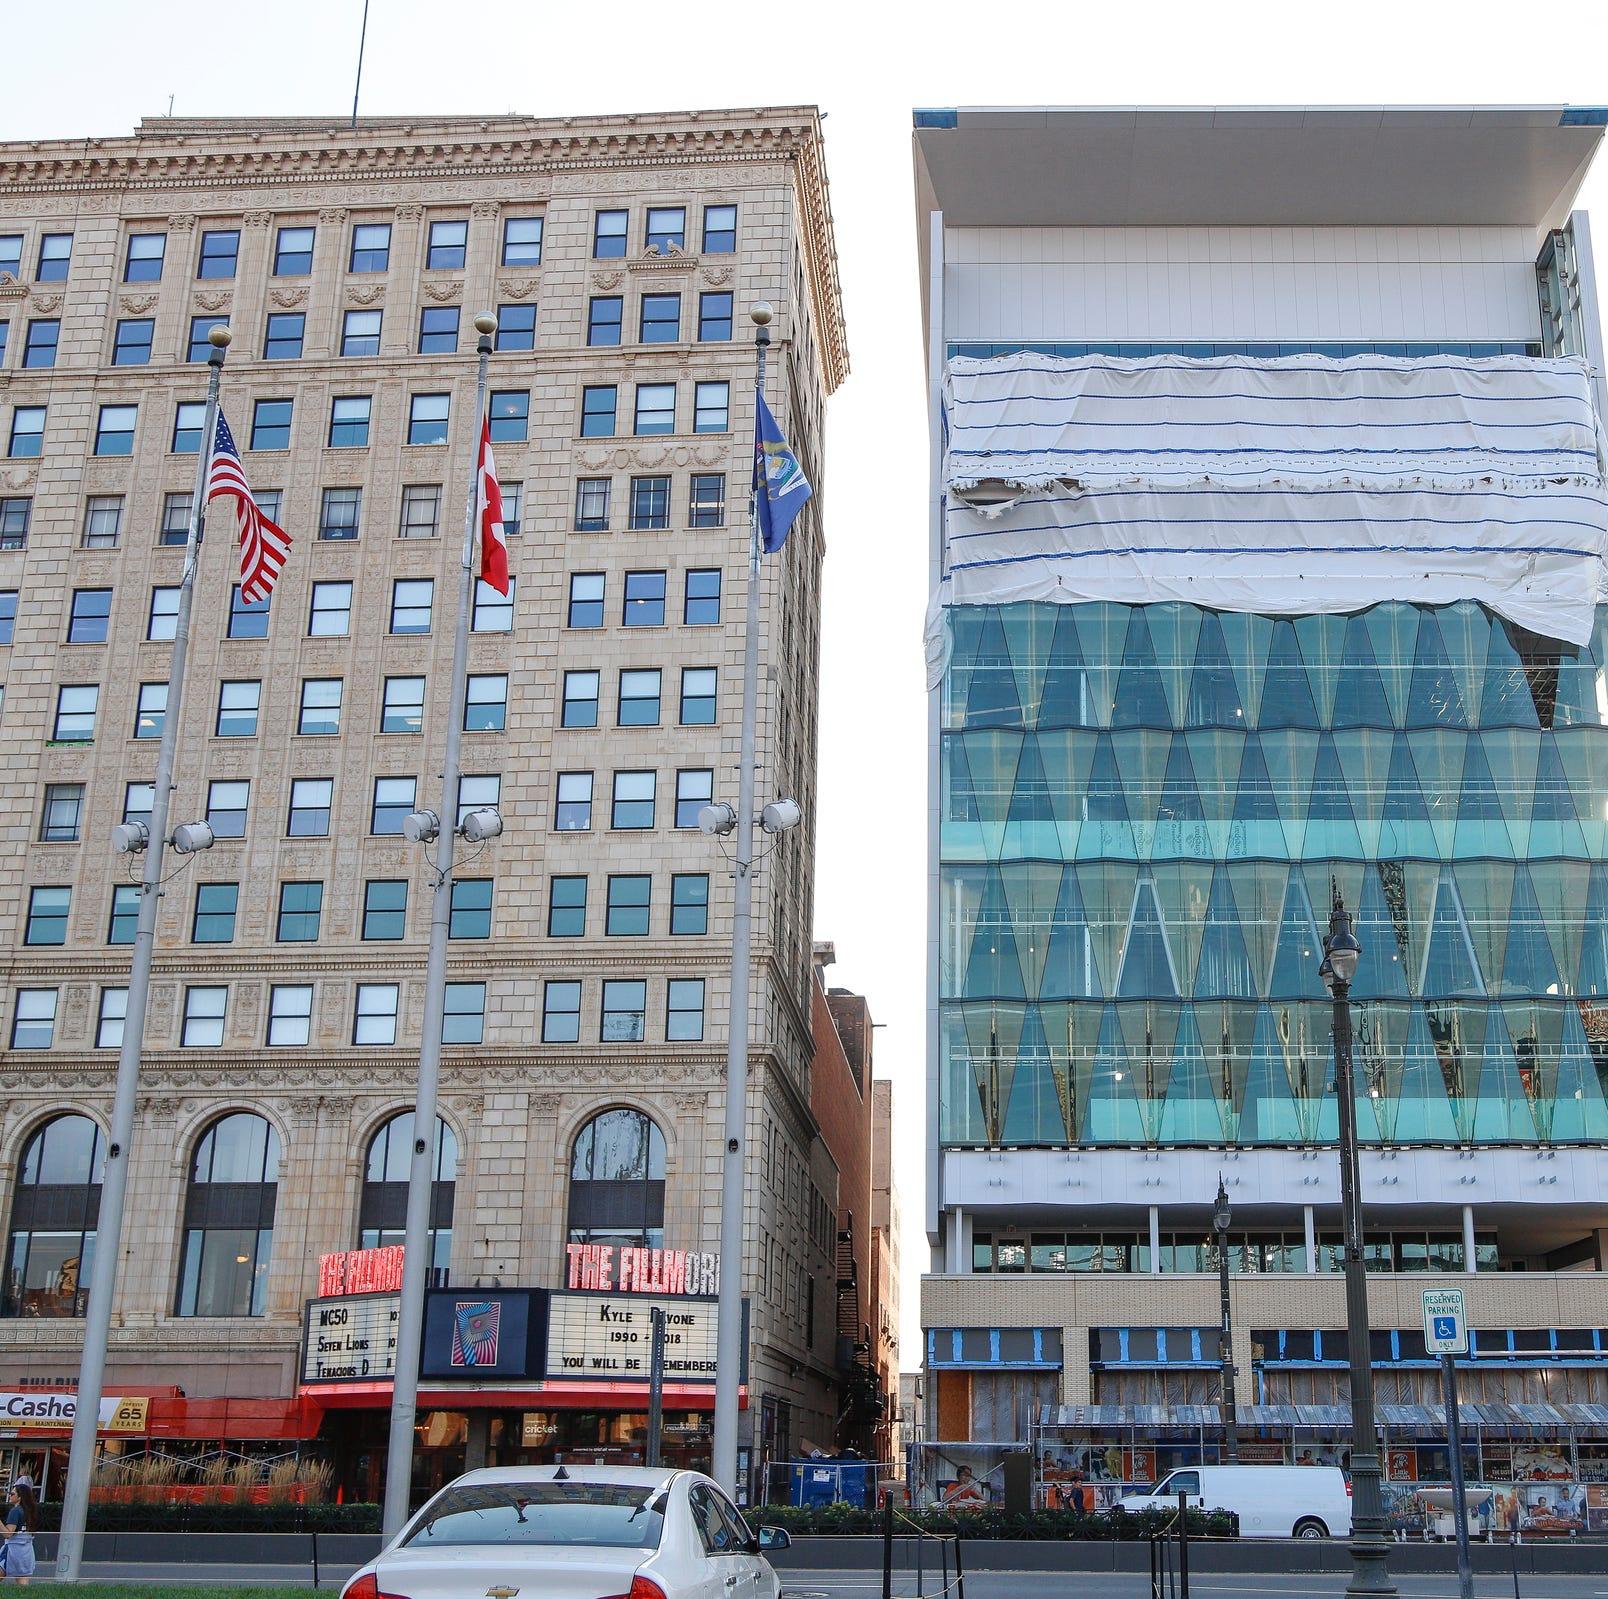 New Little Caesars headquarter building in downtown Detroit, Tuesday, September 18, 2018.